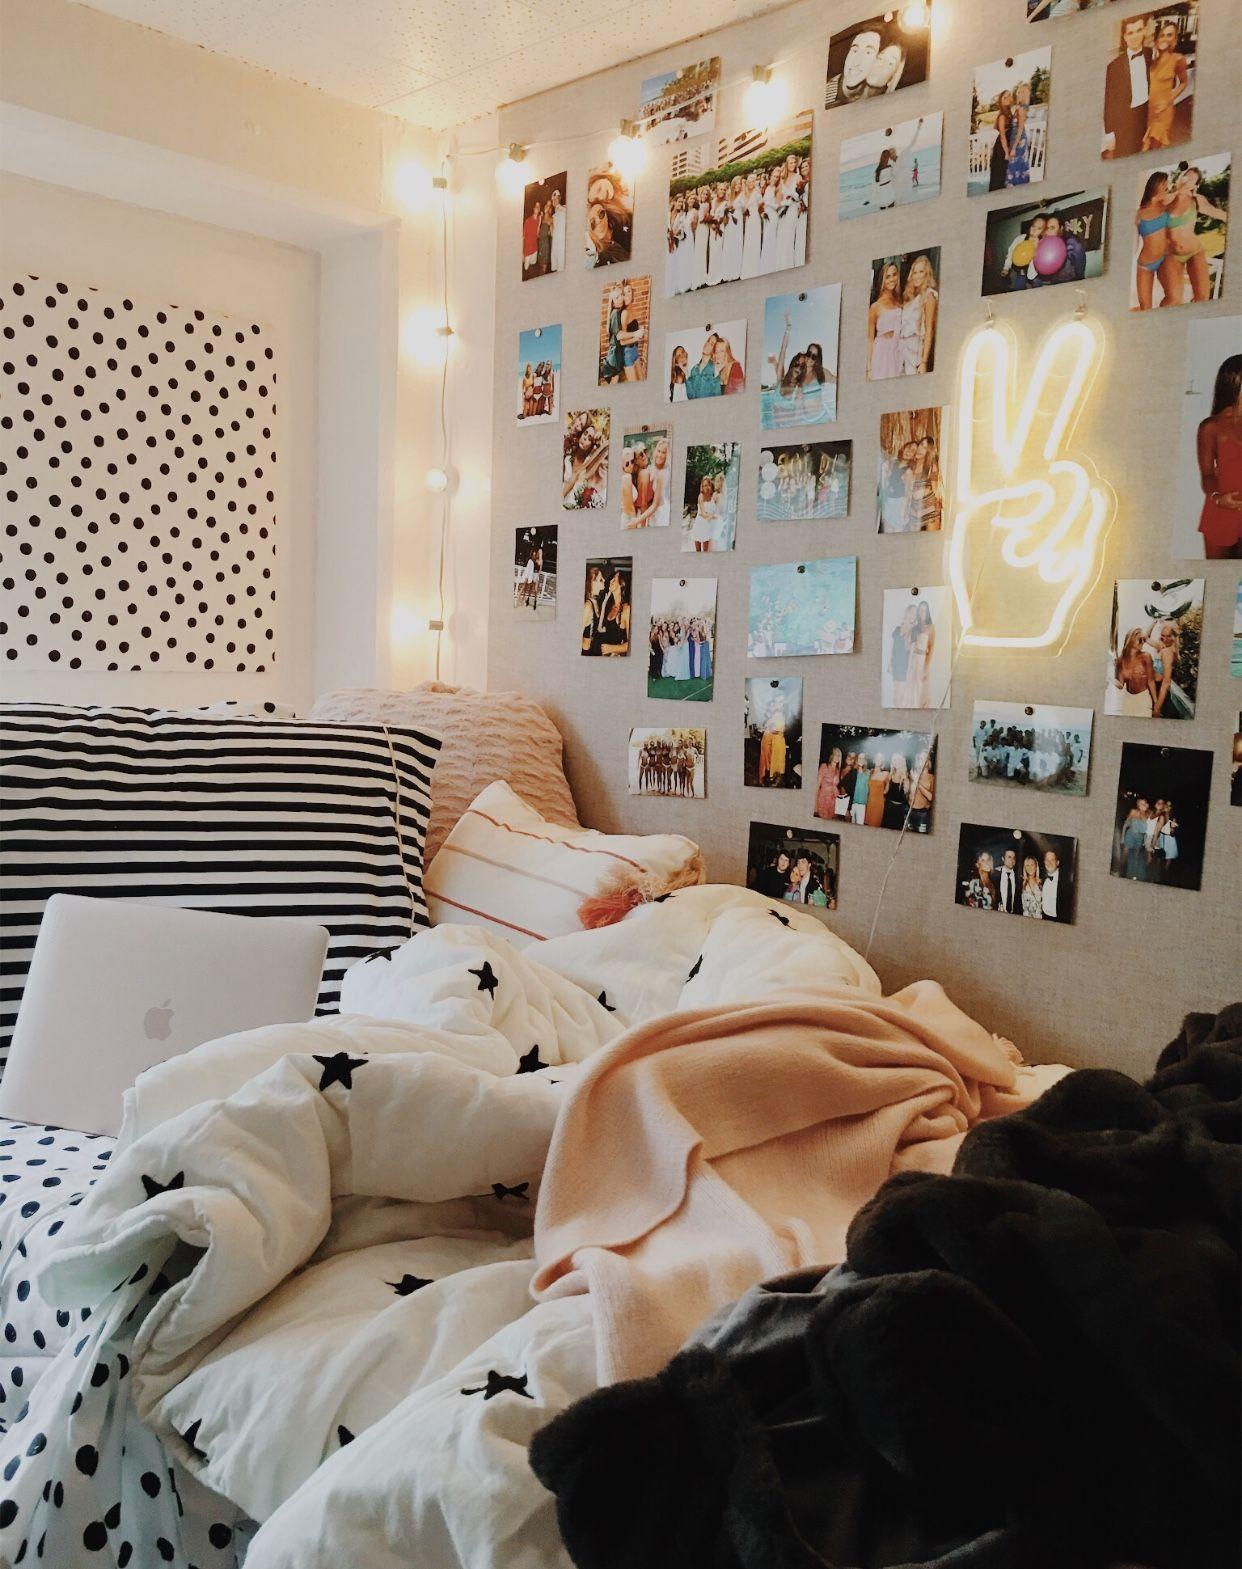 Dorm rooms at harvard pin by eby harvard on dreamhouse  pinterest  bedroom room